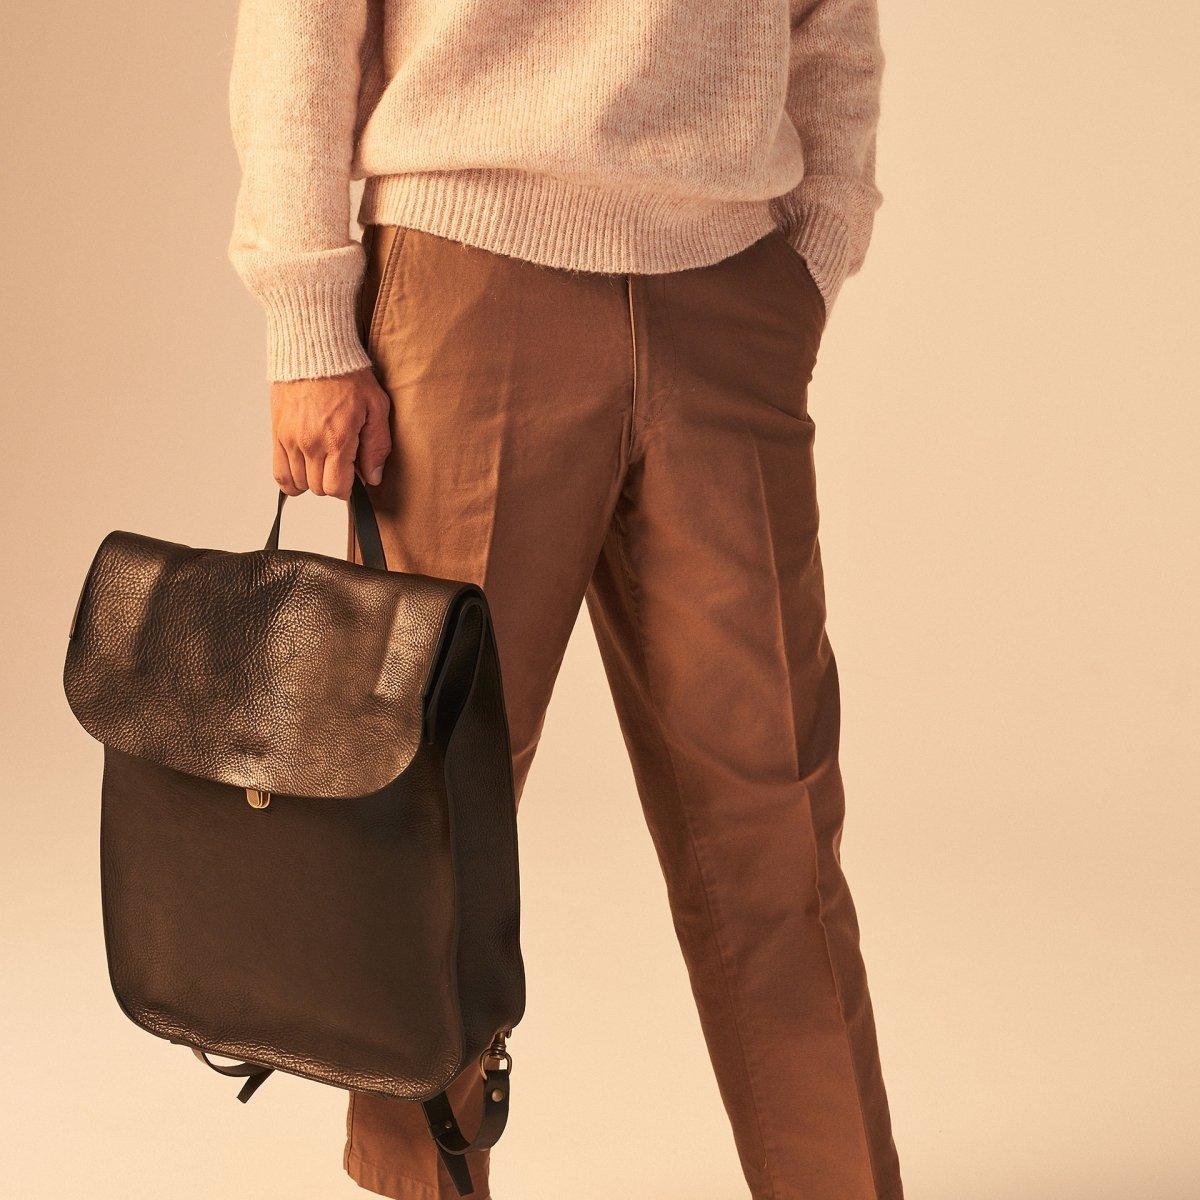 Arlo leather backpack - Black / E Pure (image n°6)